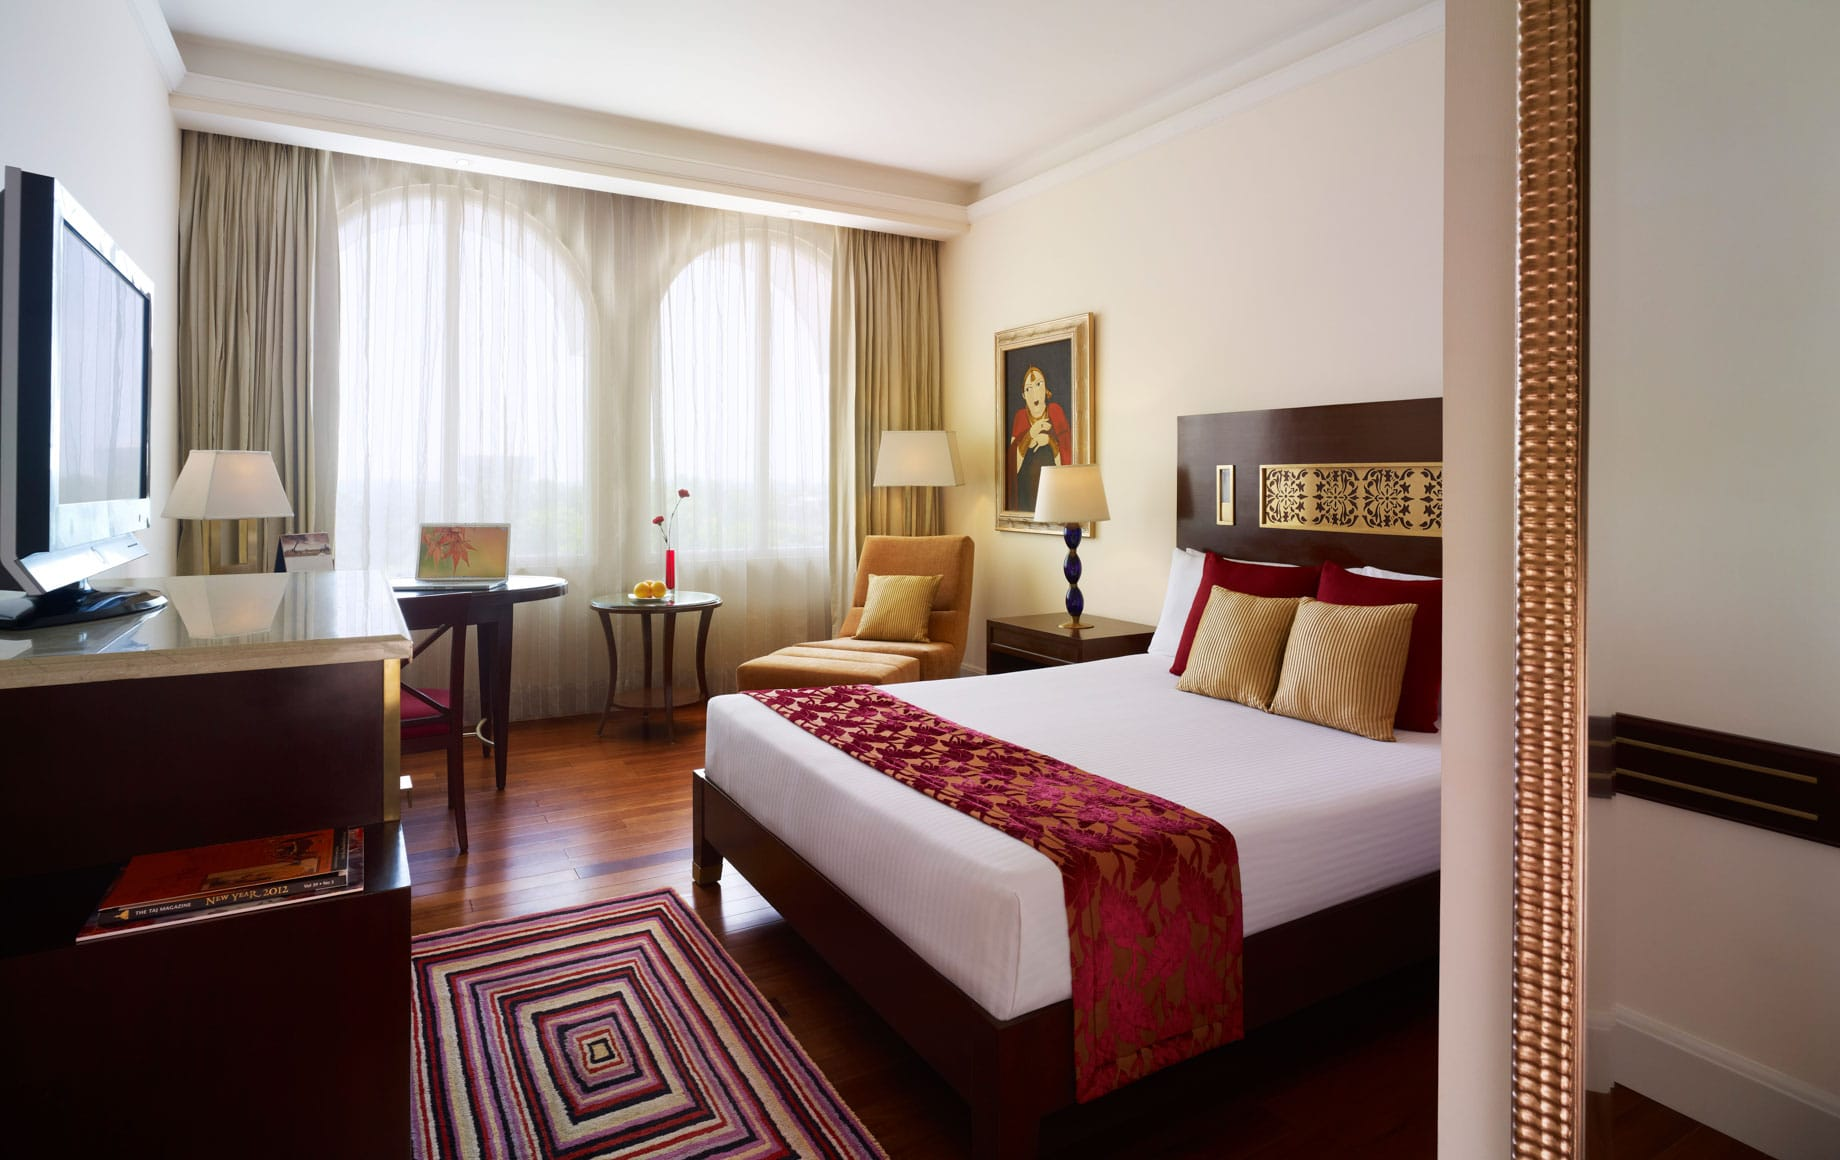 Varanasi Hotel Overview